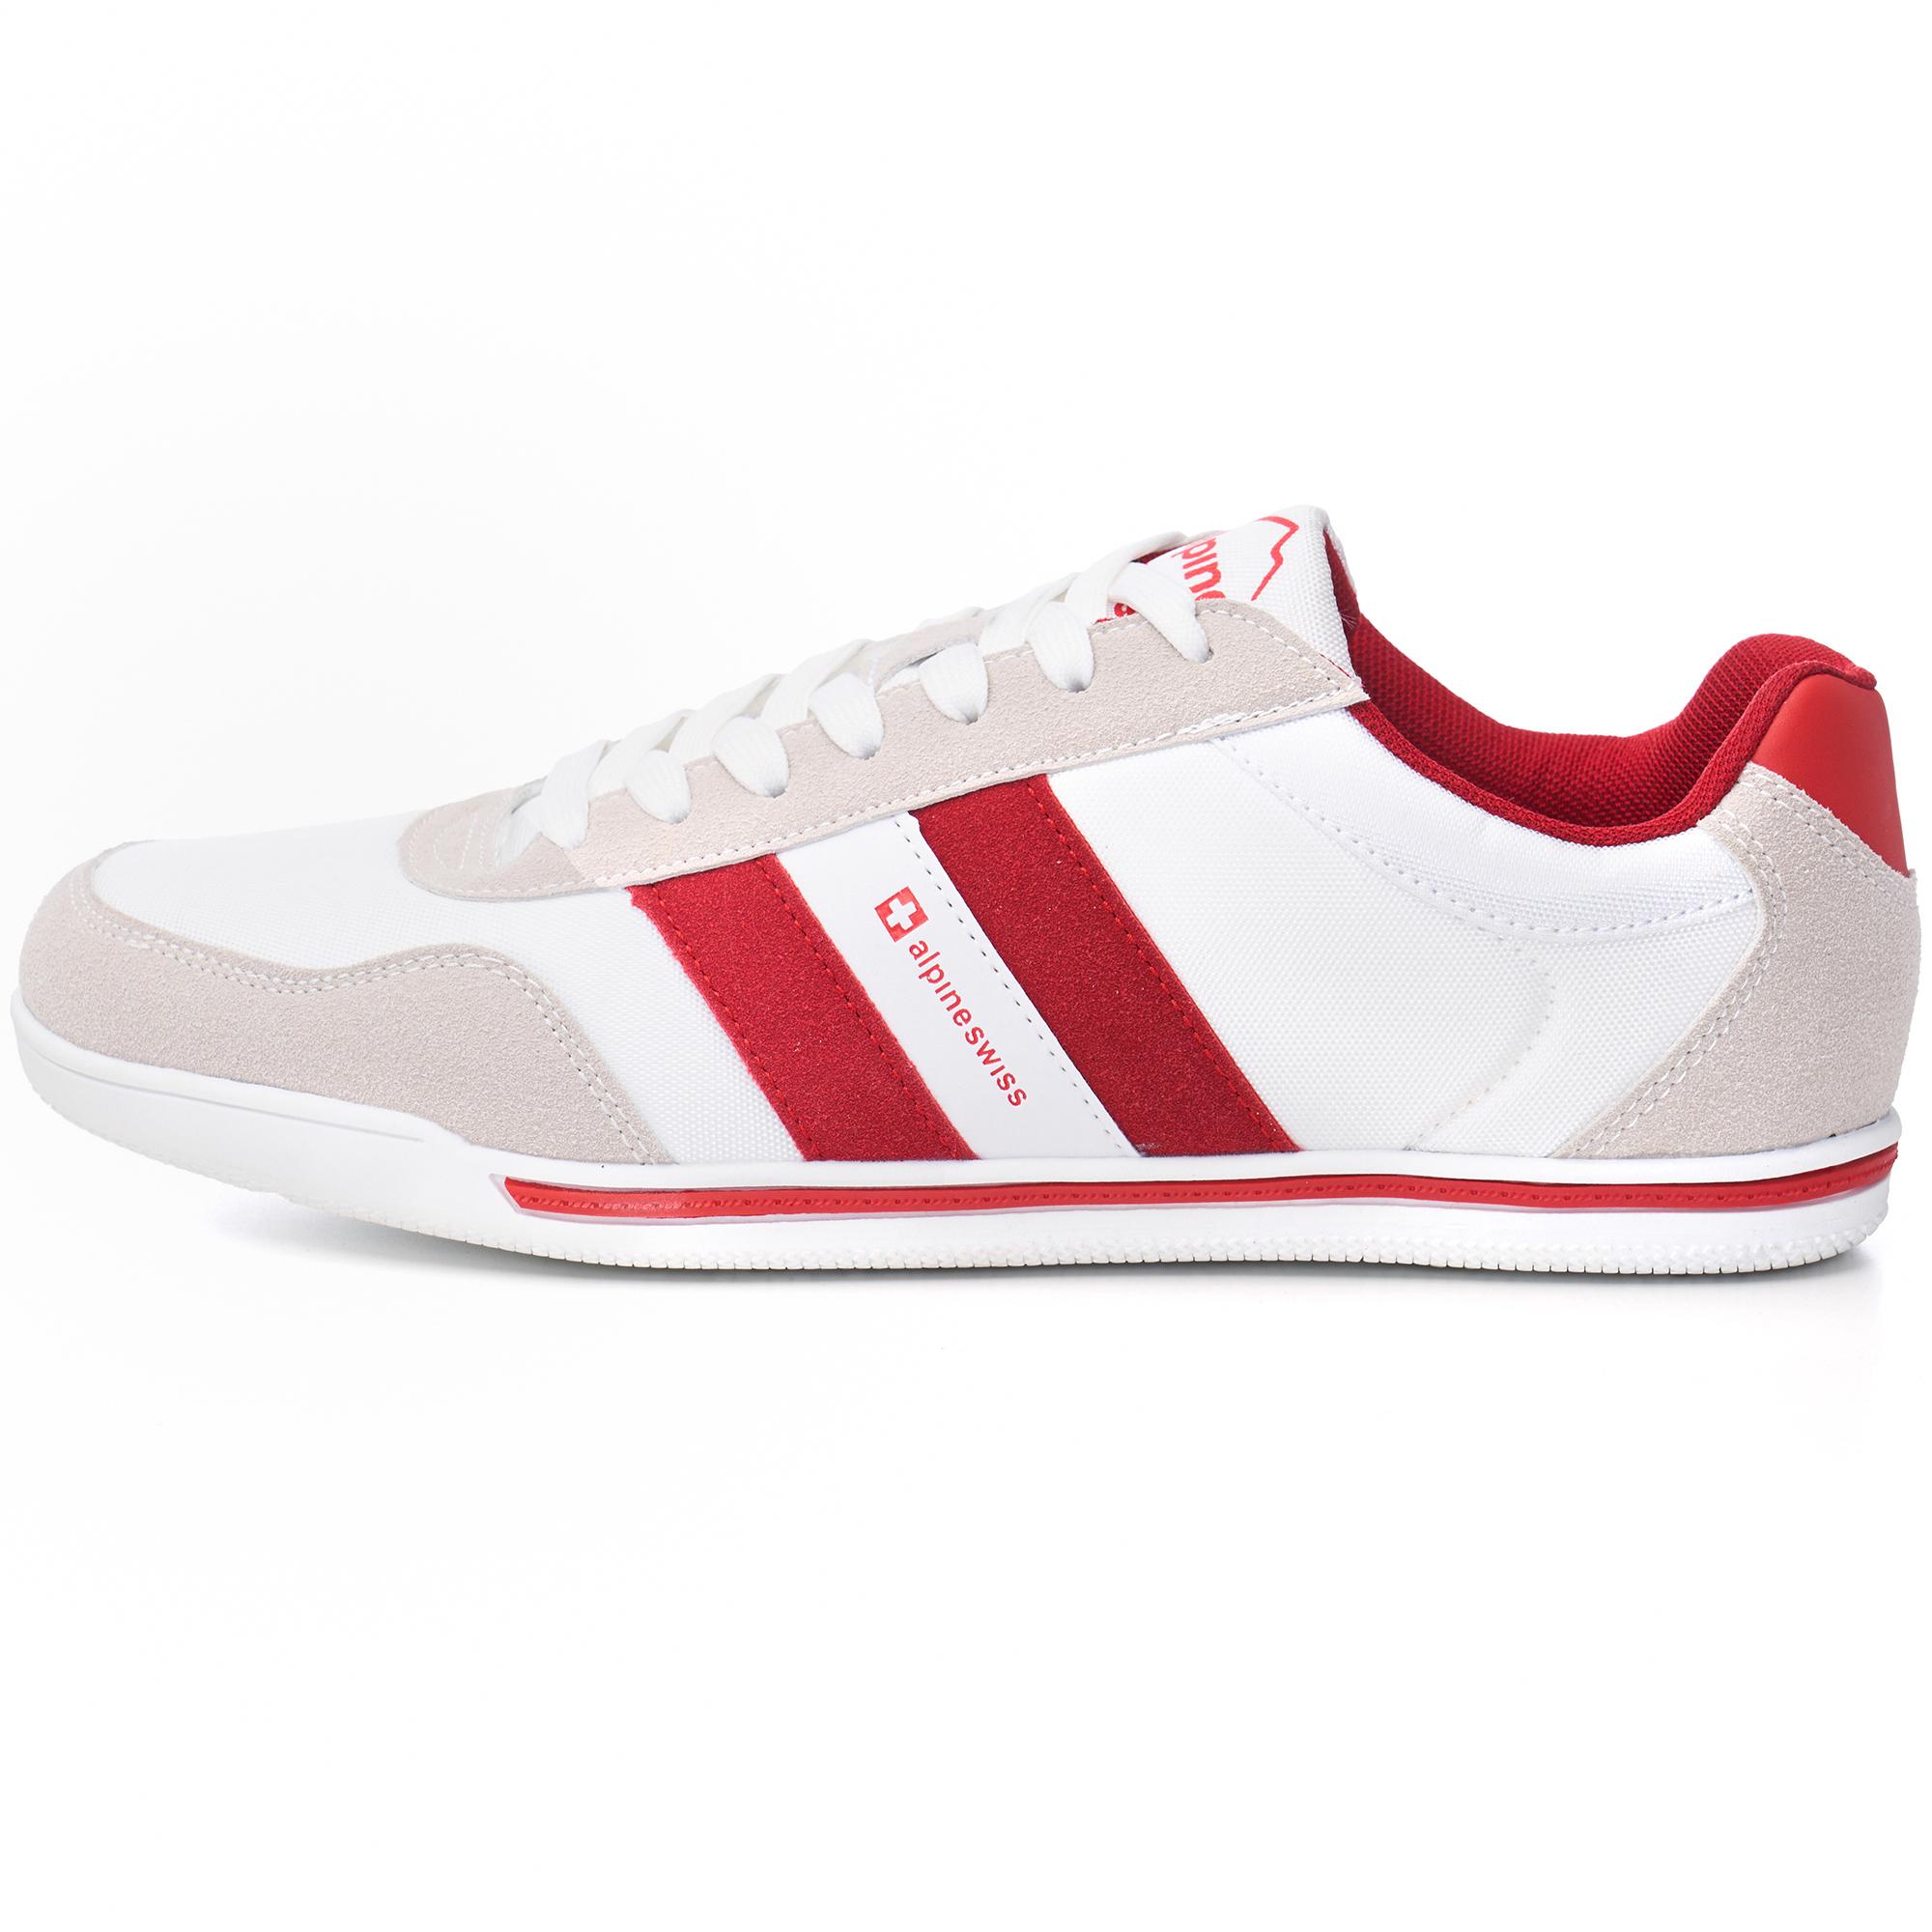 Alpine-Swiss-Haris-Mens-Retro-Striped-Athletic-Shoes-Fashion-Sneaker-Tennis-Shoe thumbnail 15